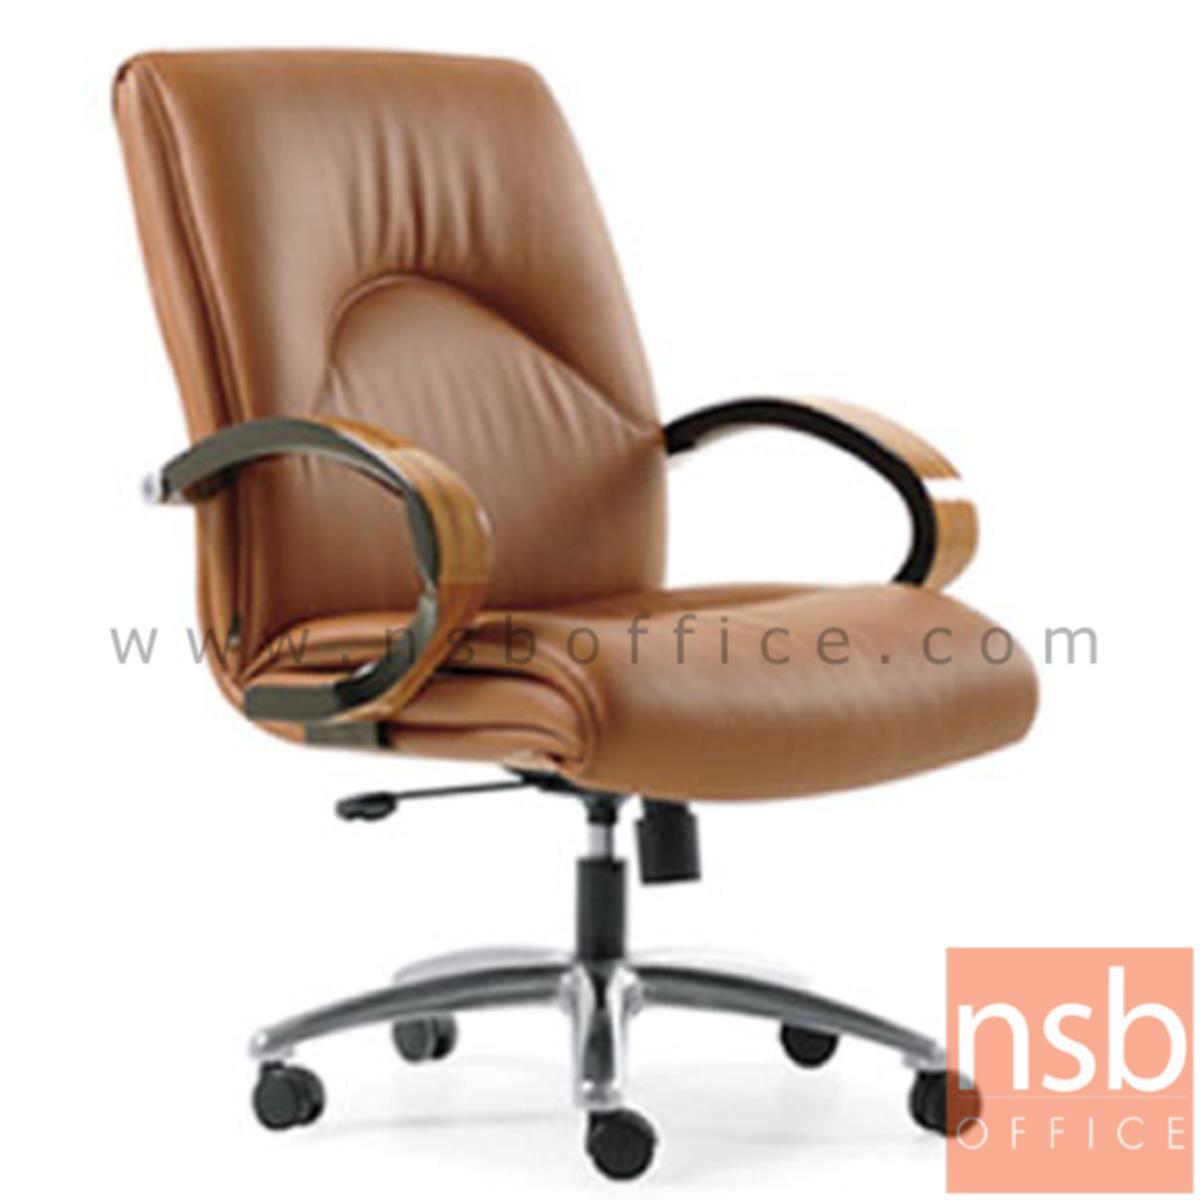 B03A481:เก้าอี้สำนักงาน รุ่น Morley (มอเรย์)  โช๊คแก๊ส ก้อนโยก ขาอลูมิเนียม